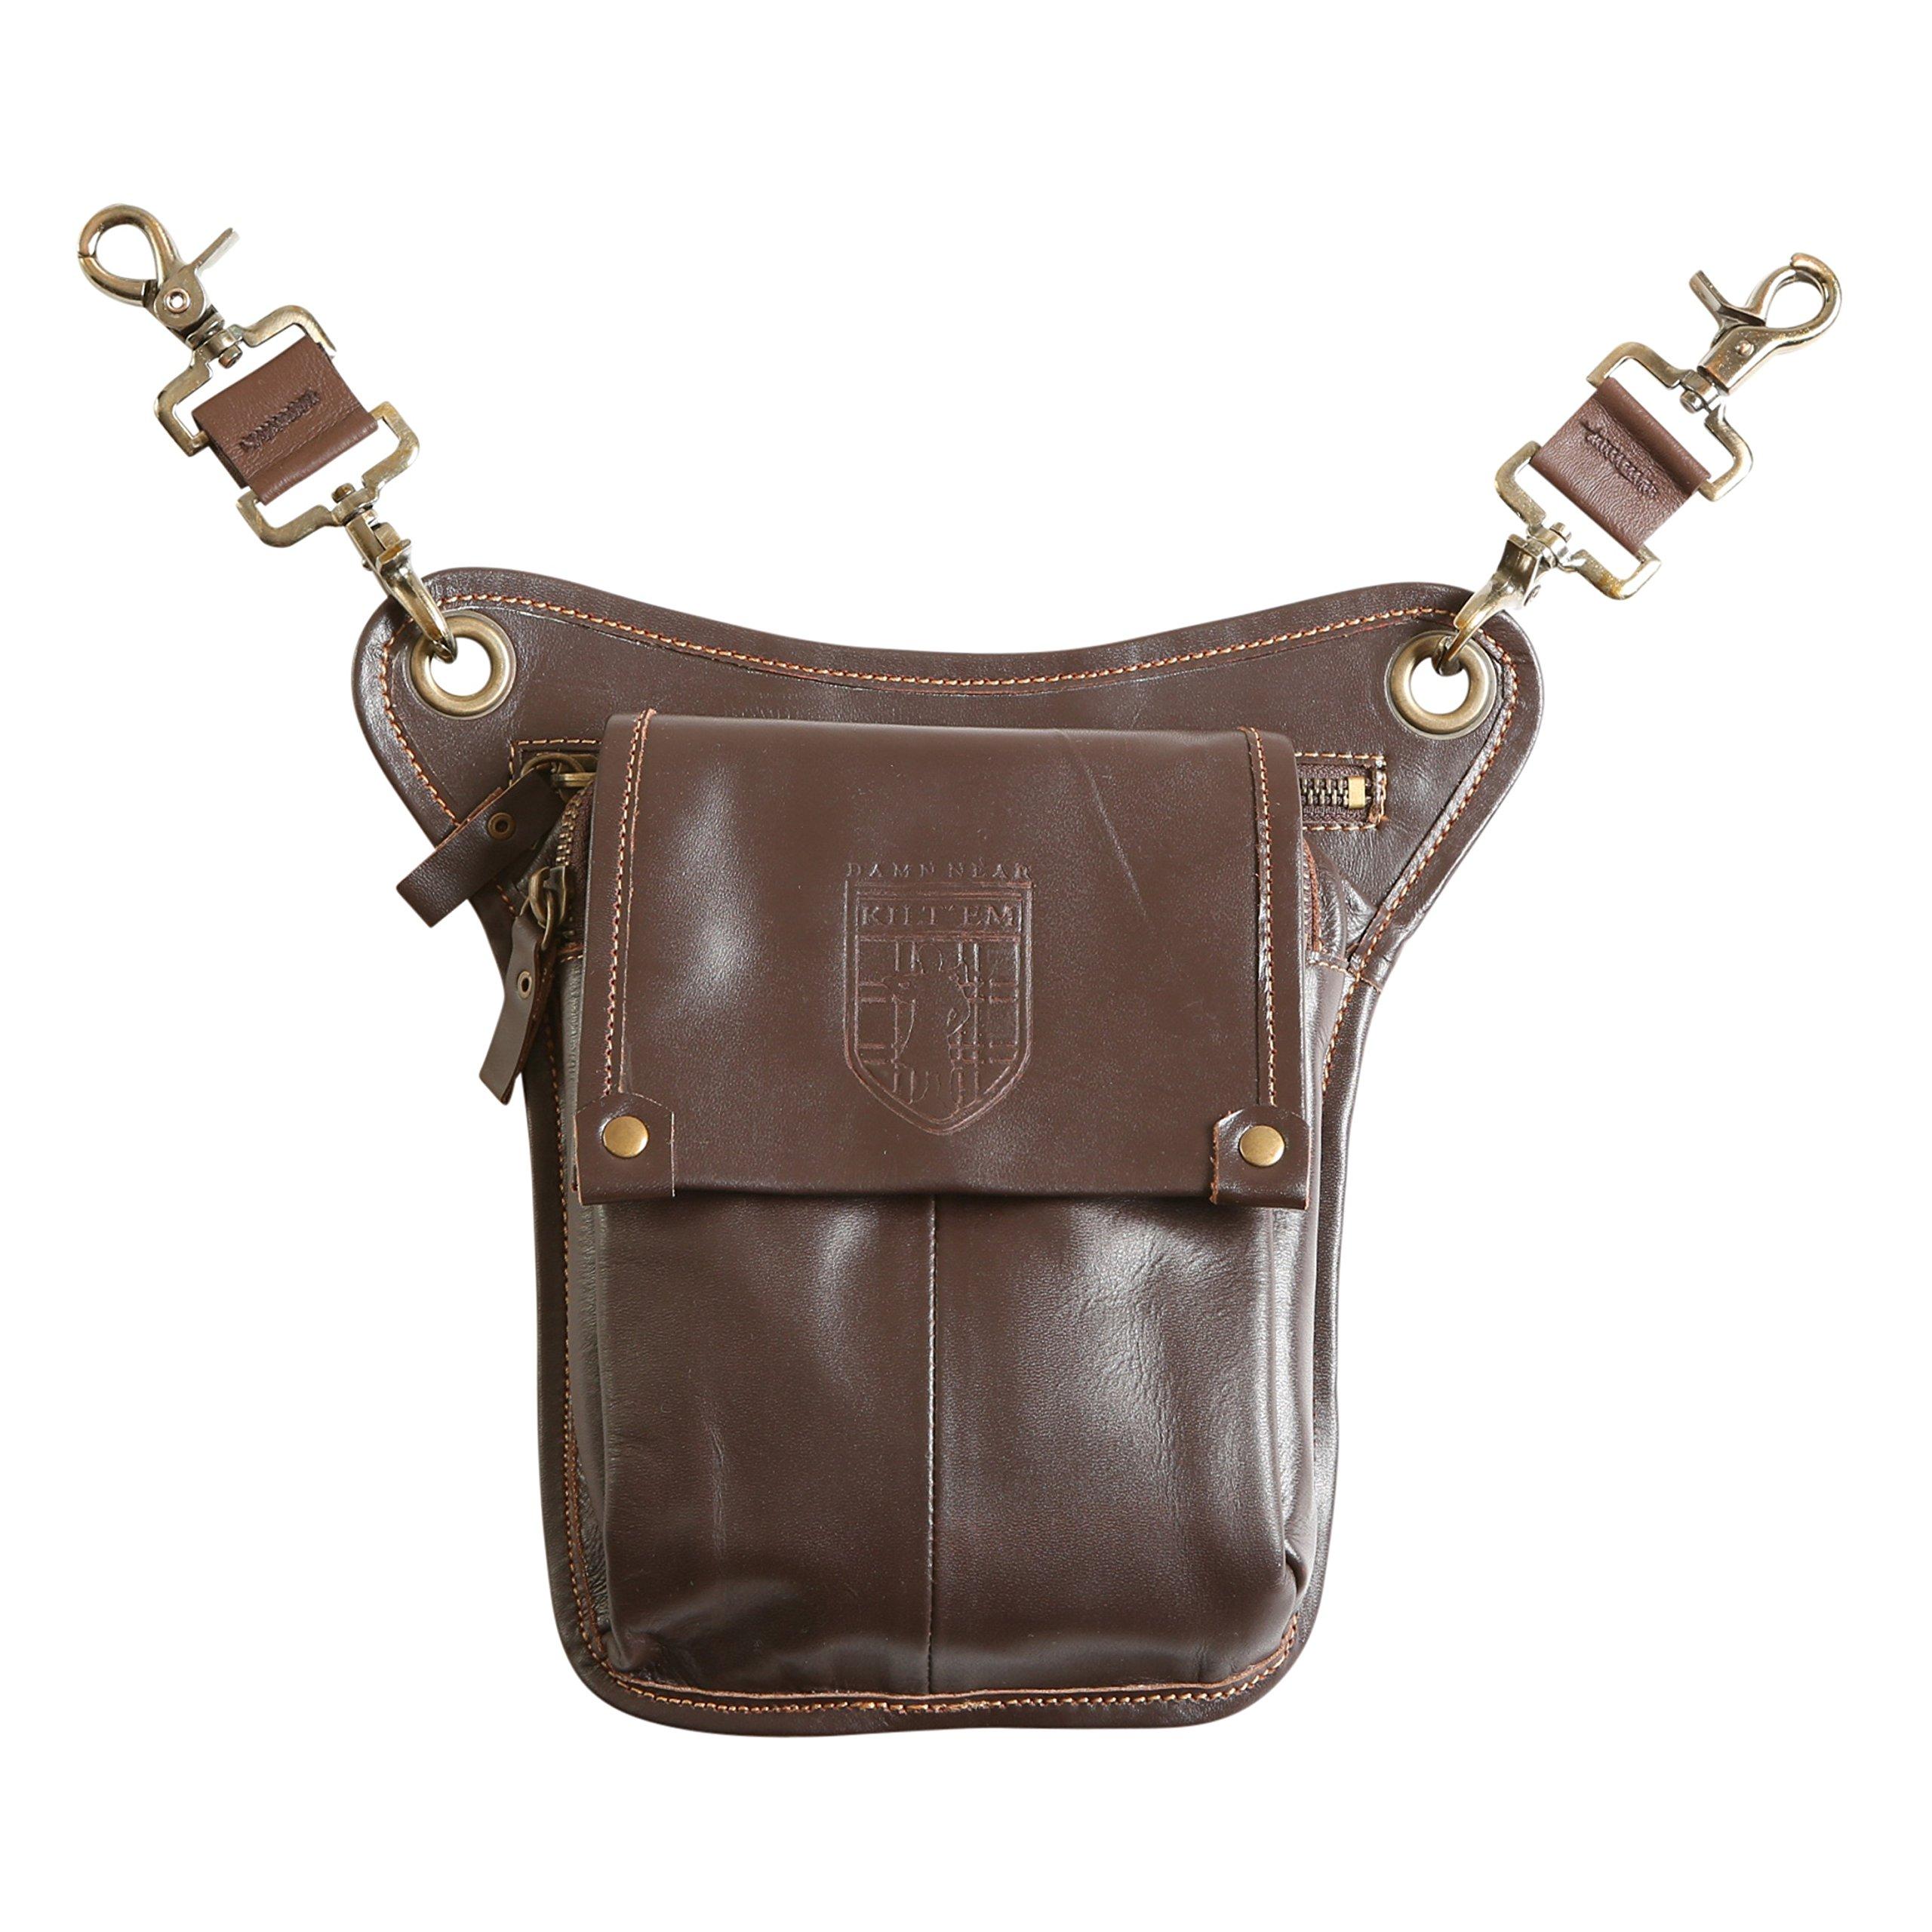 Damn Near Kilt 'Em Premium Brown Leather Sporran Kilt Accessory